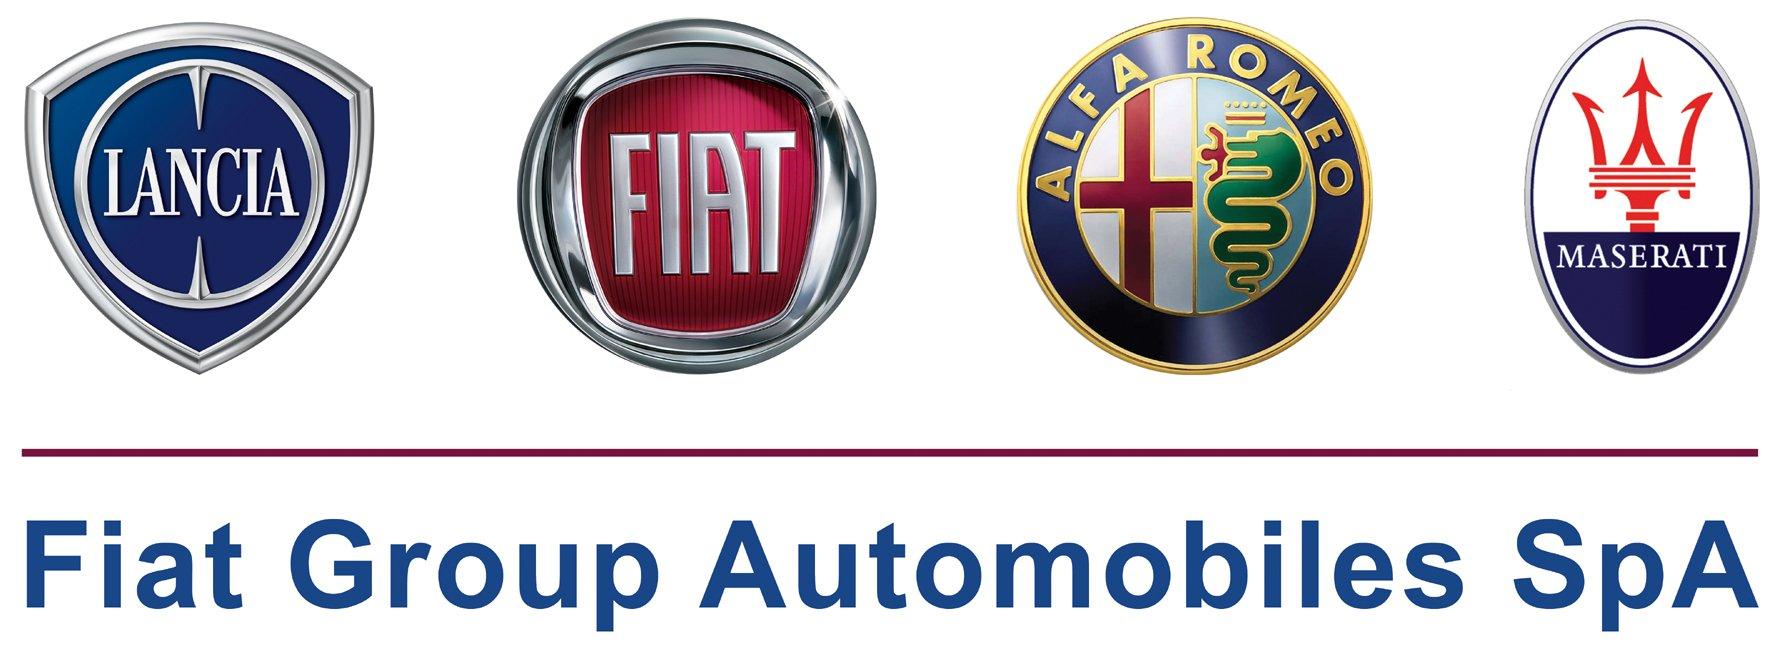 Fiat Group Automobiles